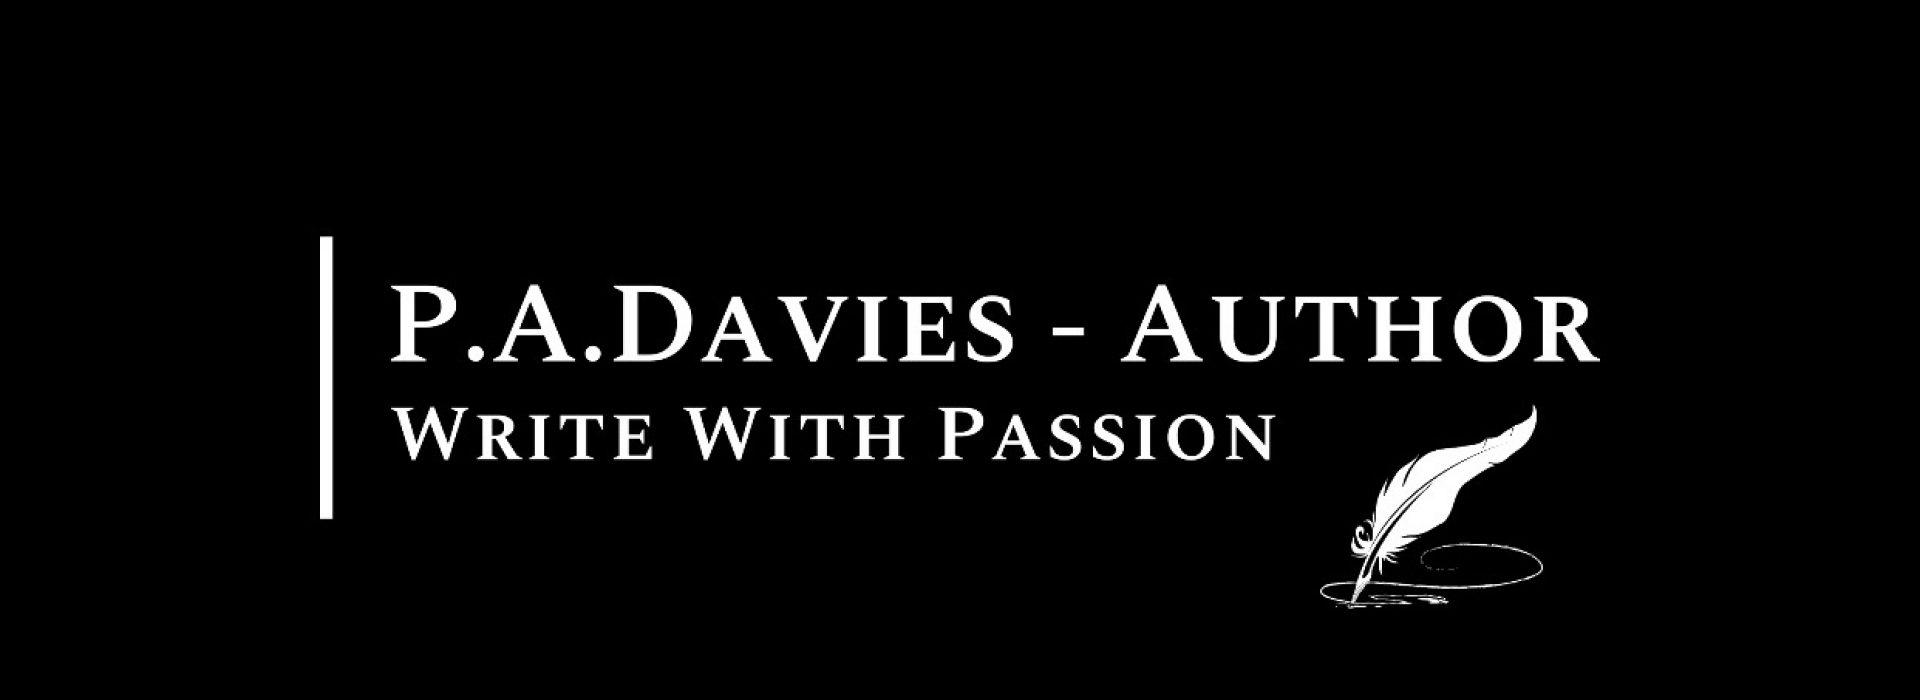 Official Website Of P.A.Davies